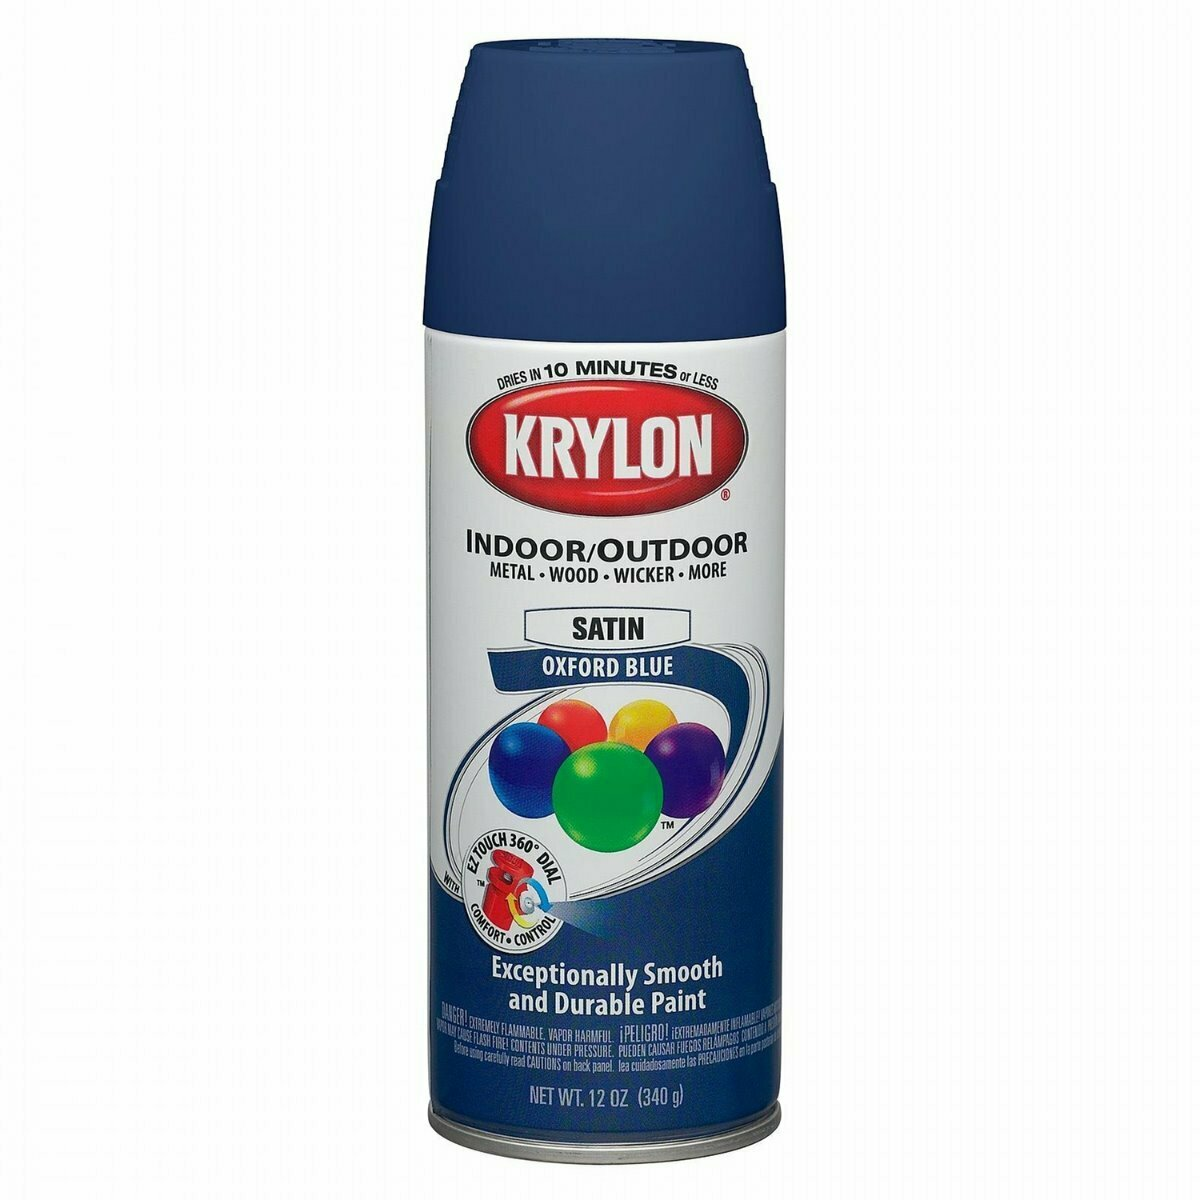 AEROSOL KRYLON SATIN OXFORD BLUE